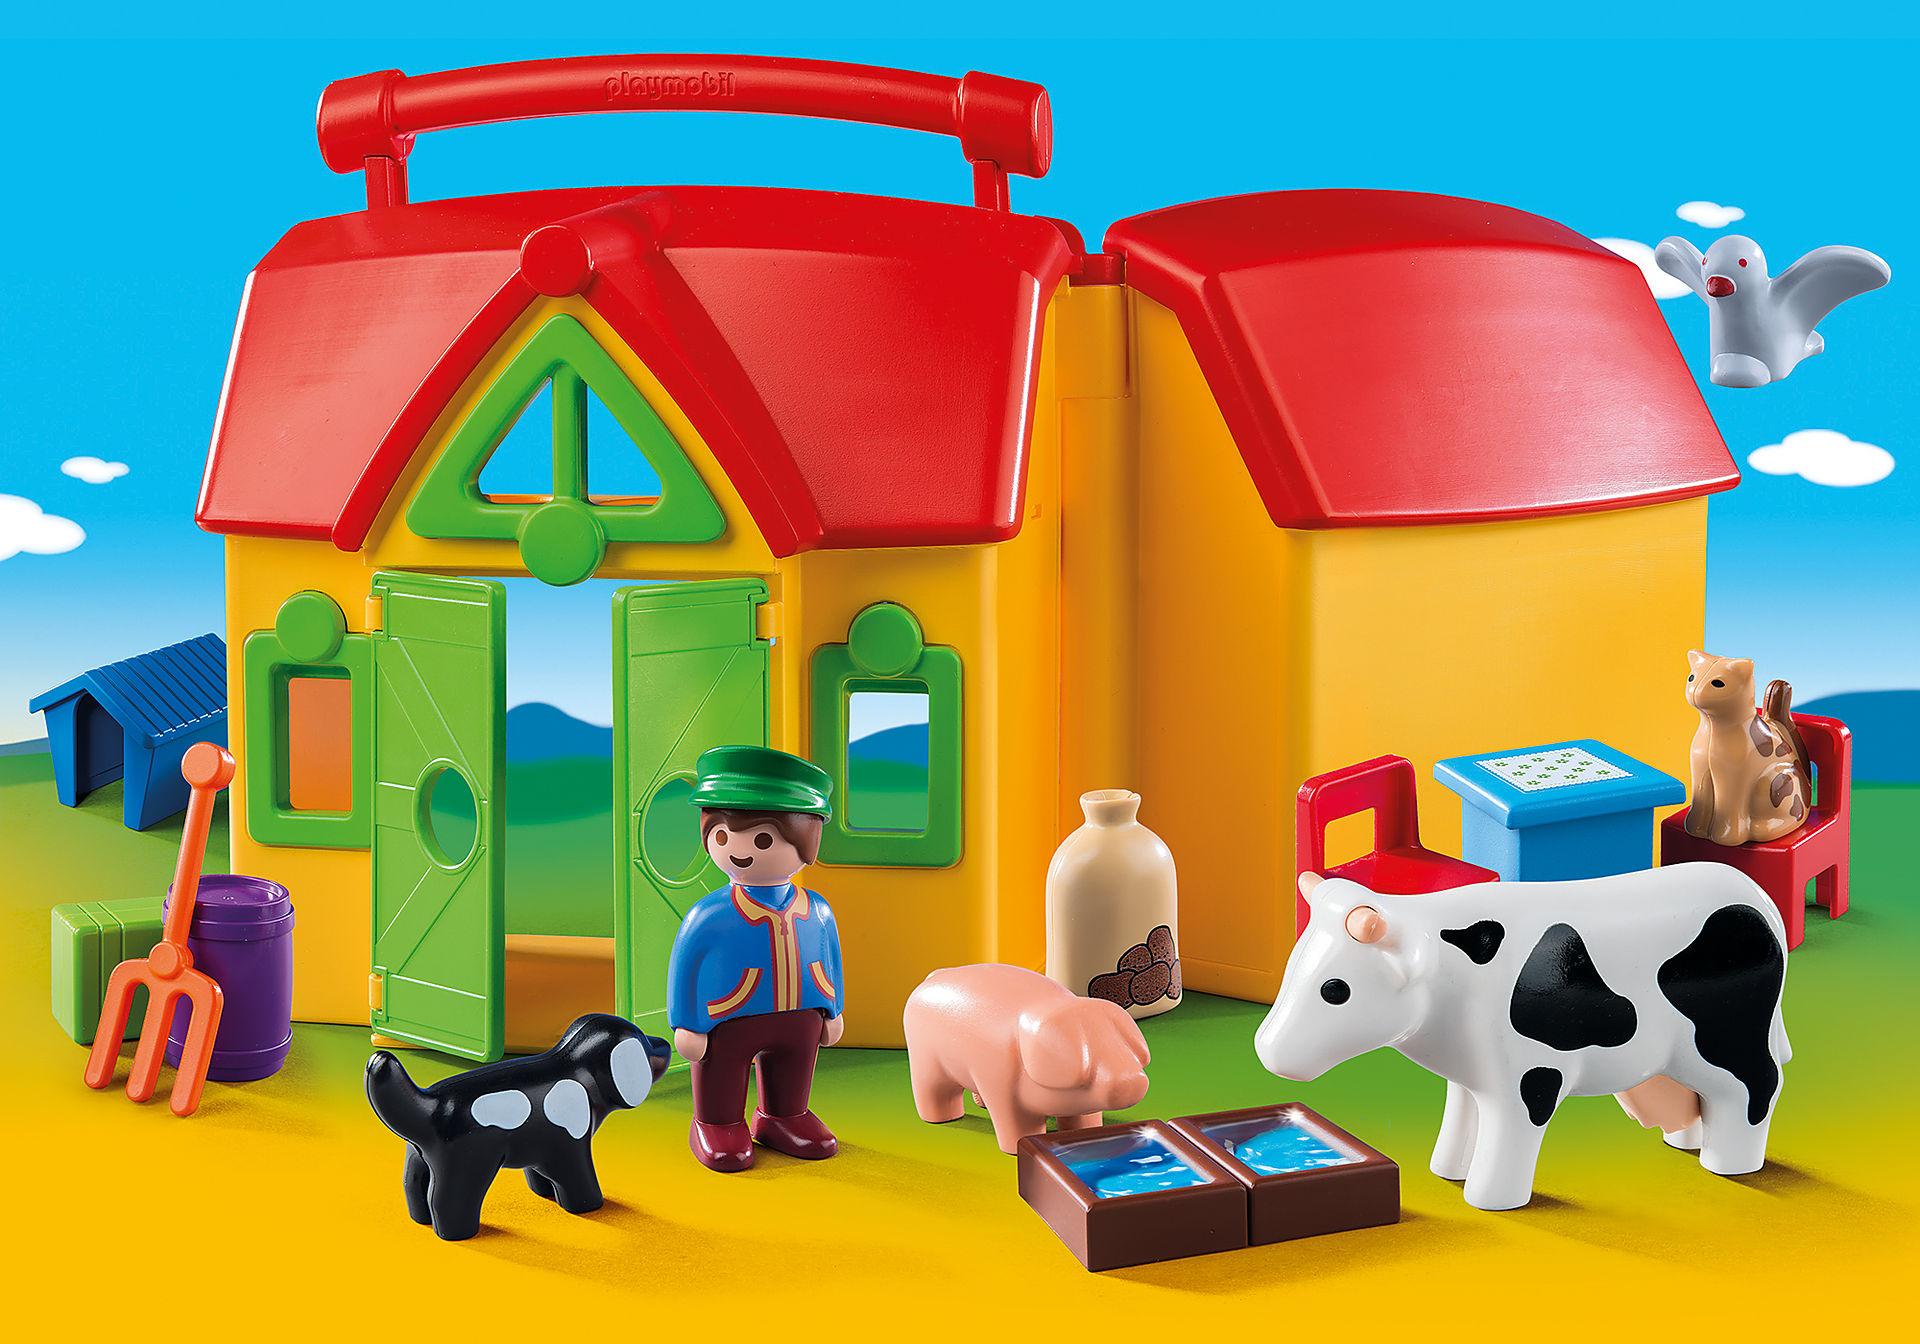 6962 Meeneemboerderij met dieren zoom image1